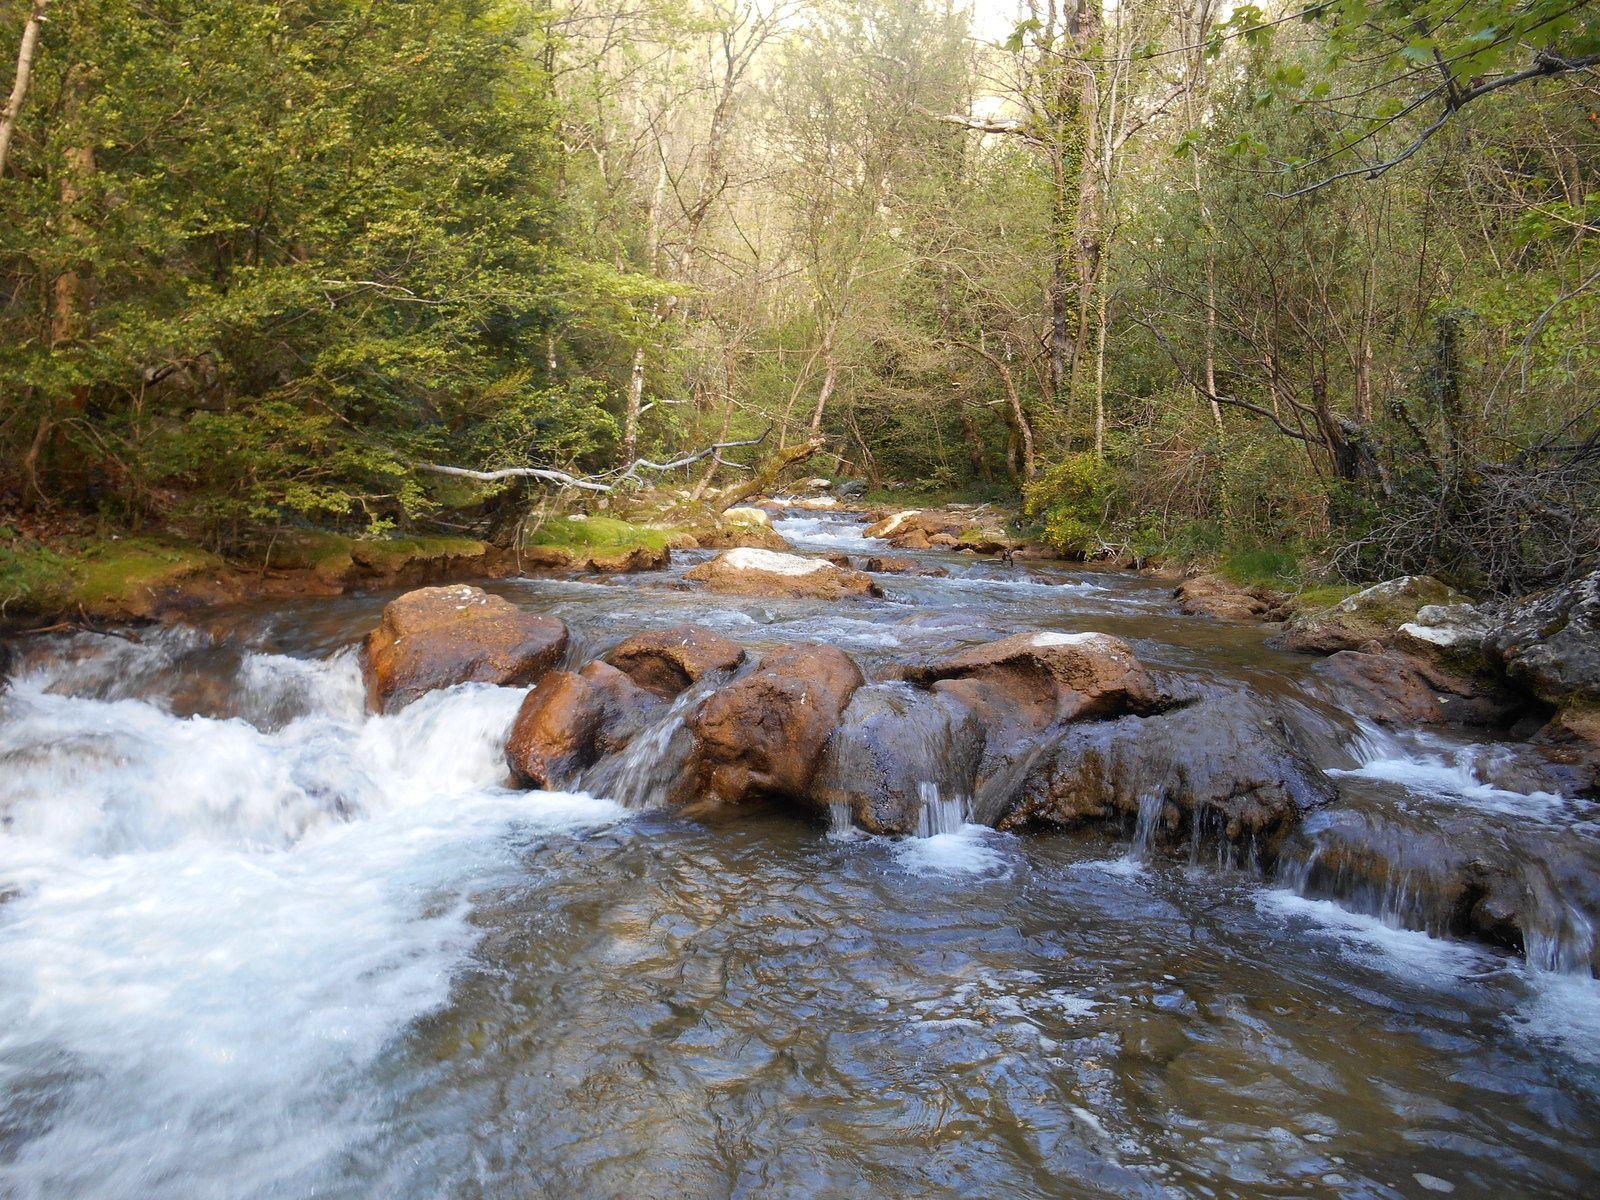 Opération rivières propres ( samedi 11 avril)